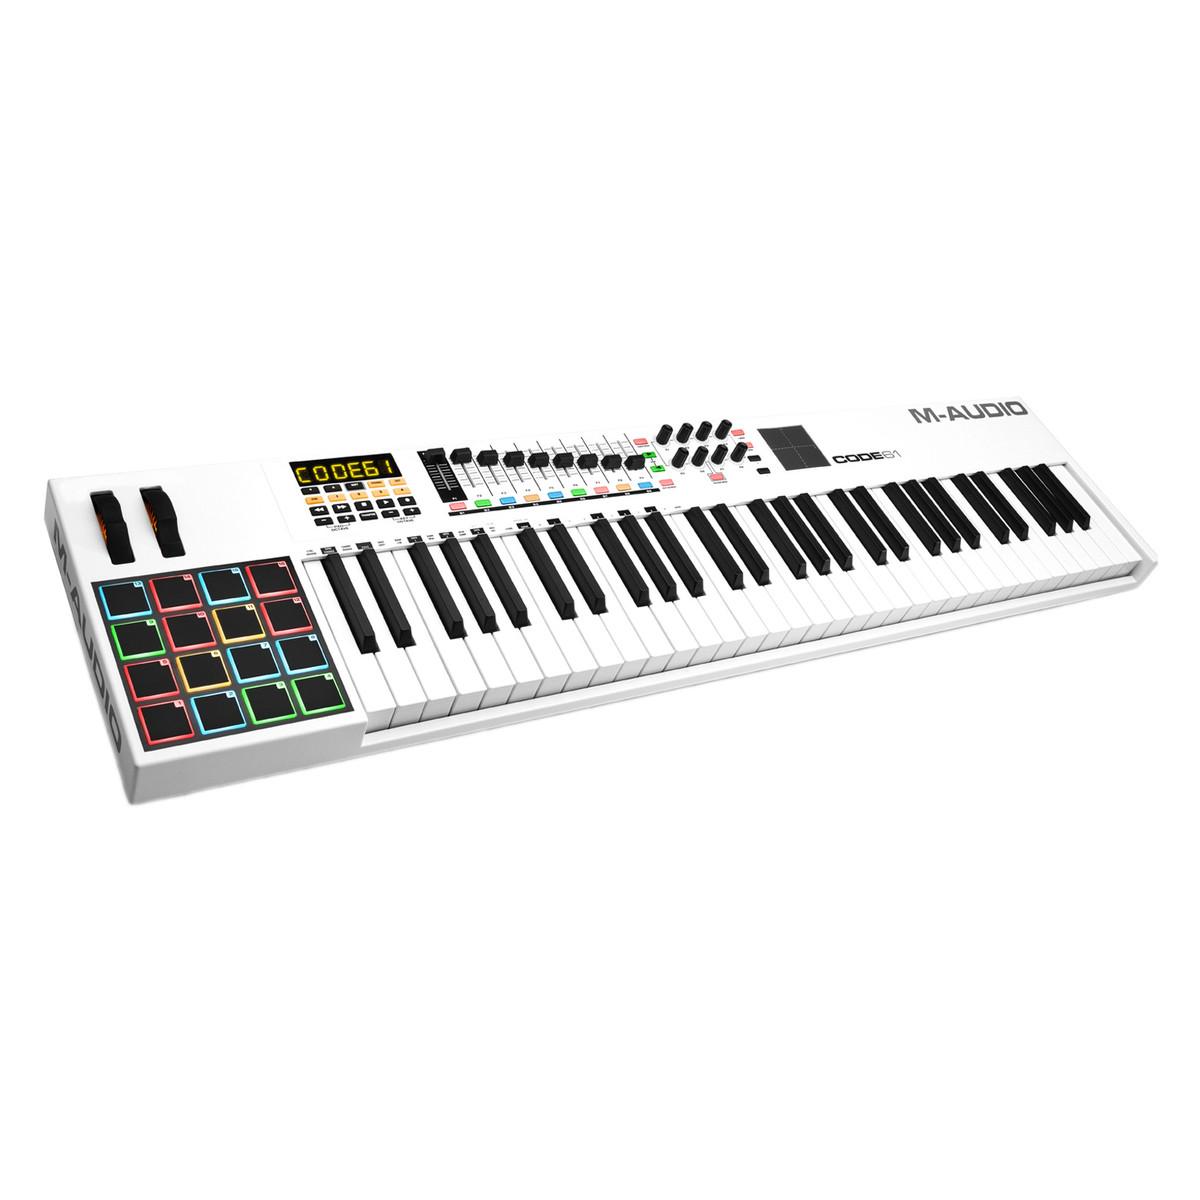 M Audio Code 61 Controller Keyboard